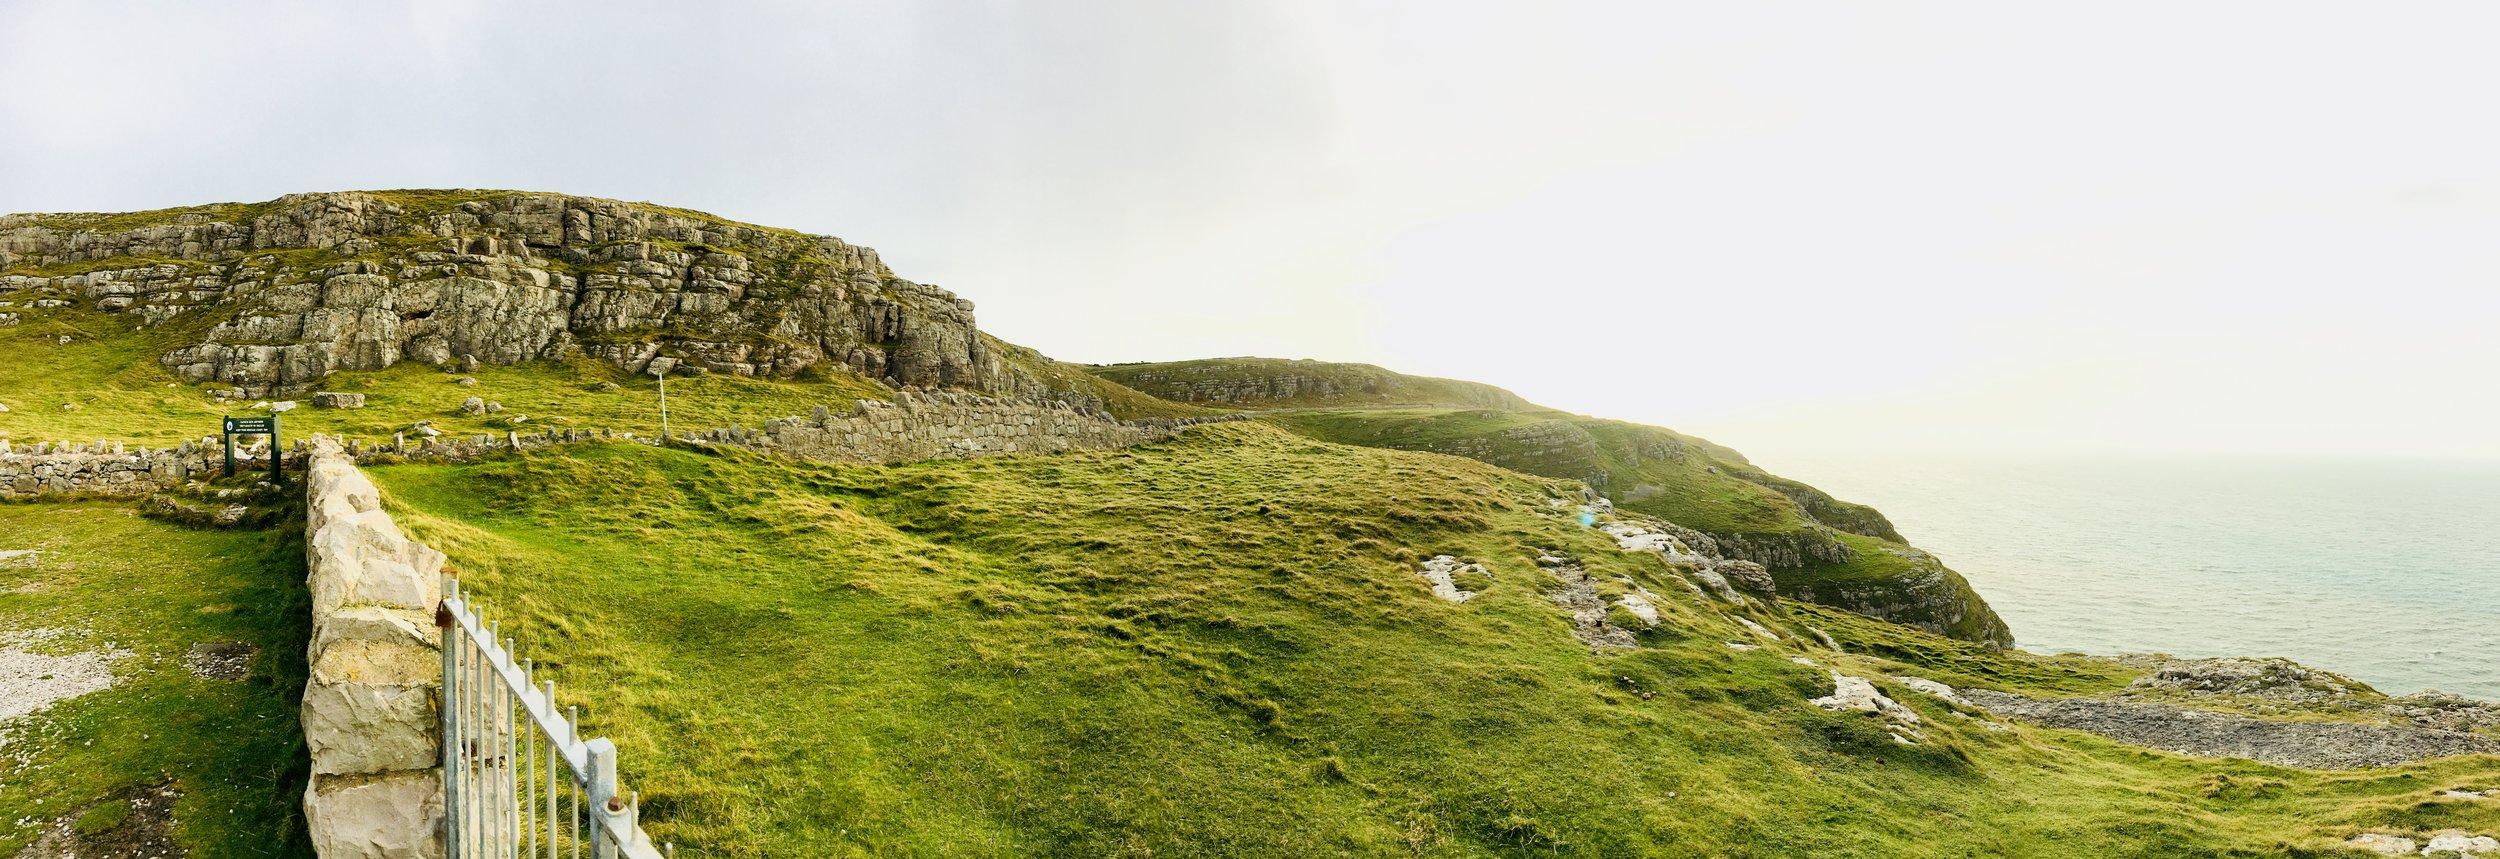 Llandudno Wales Great Orme